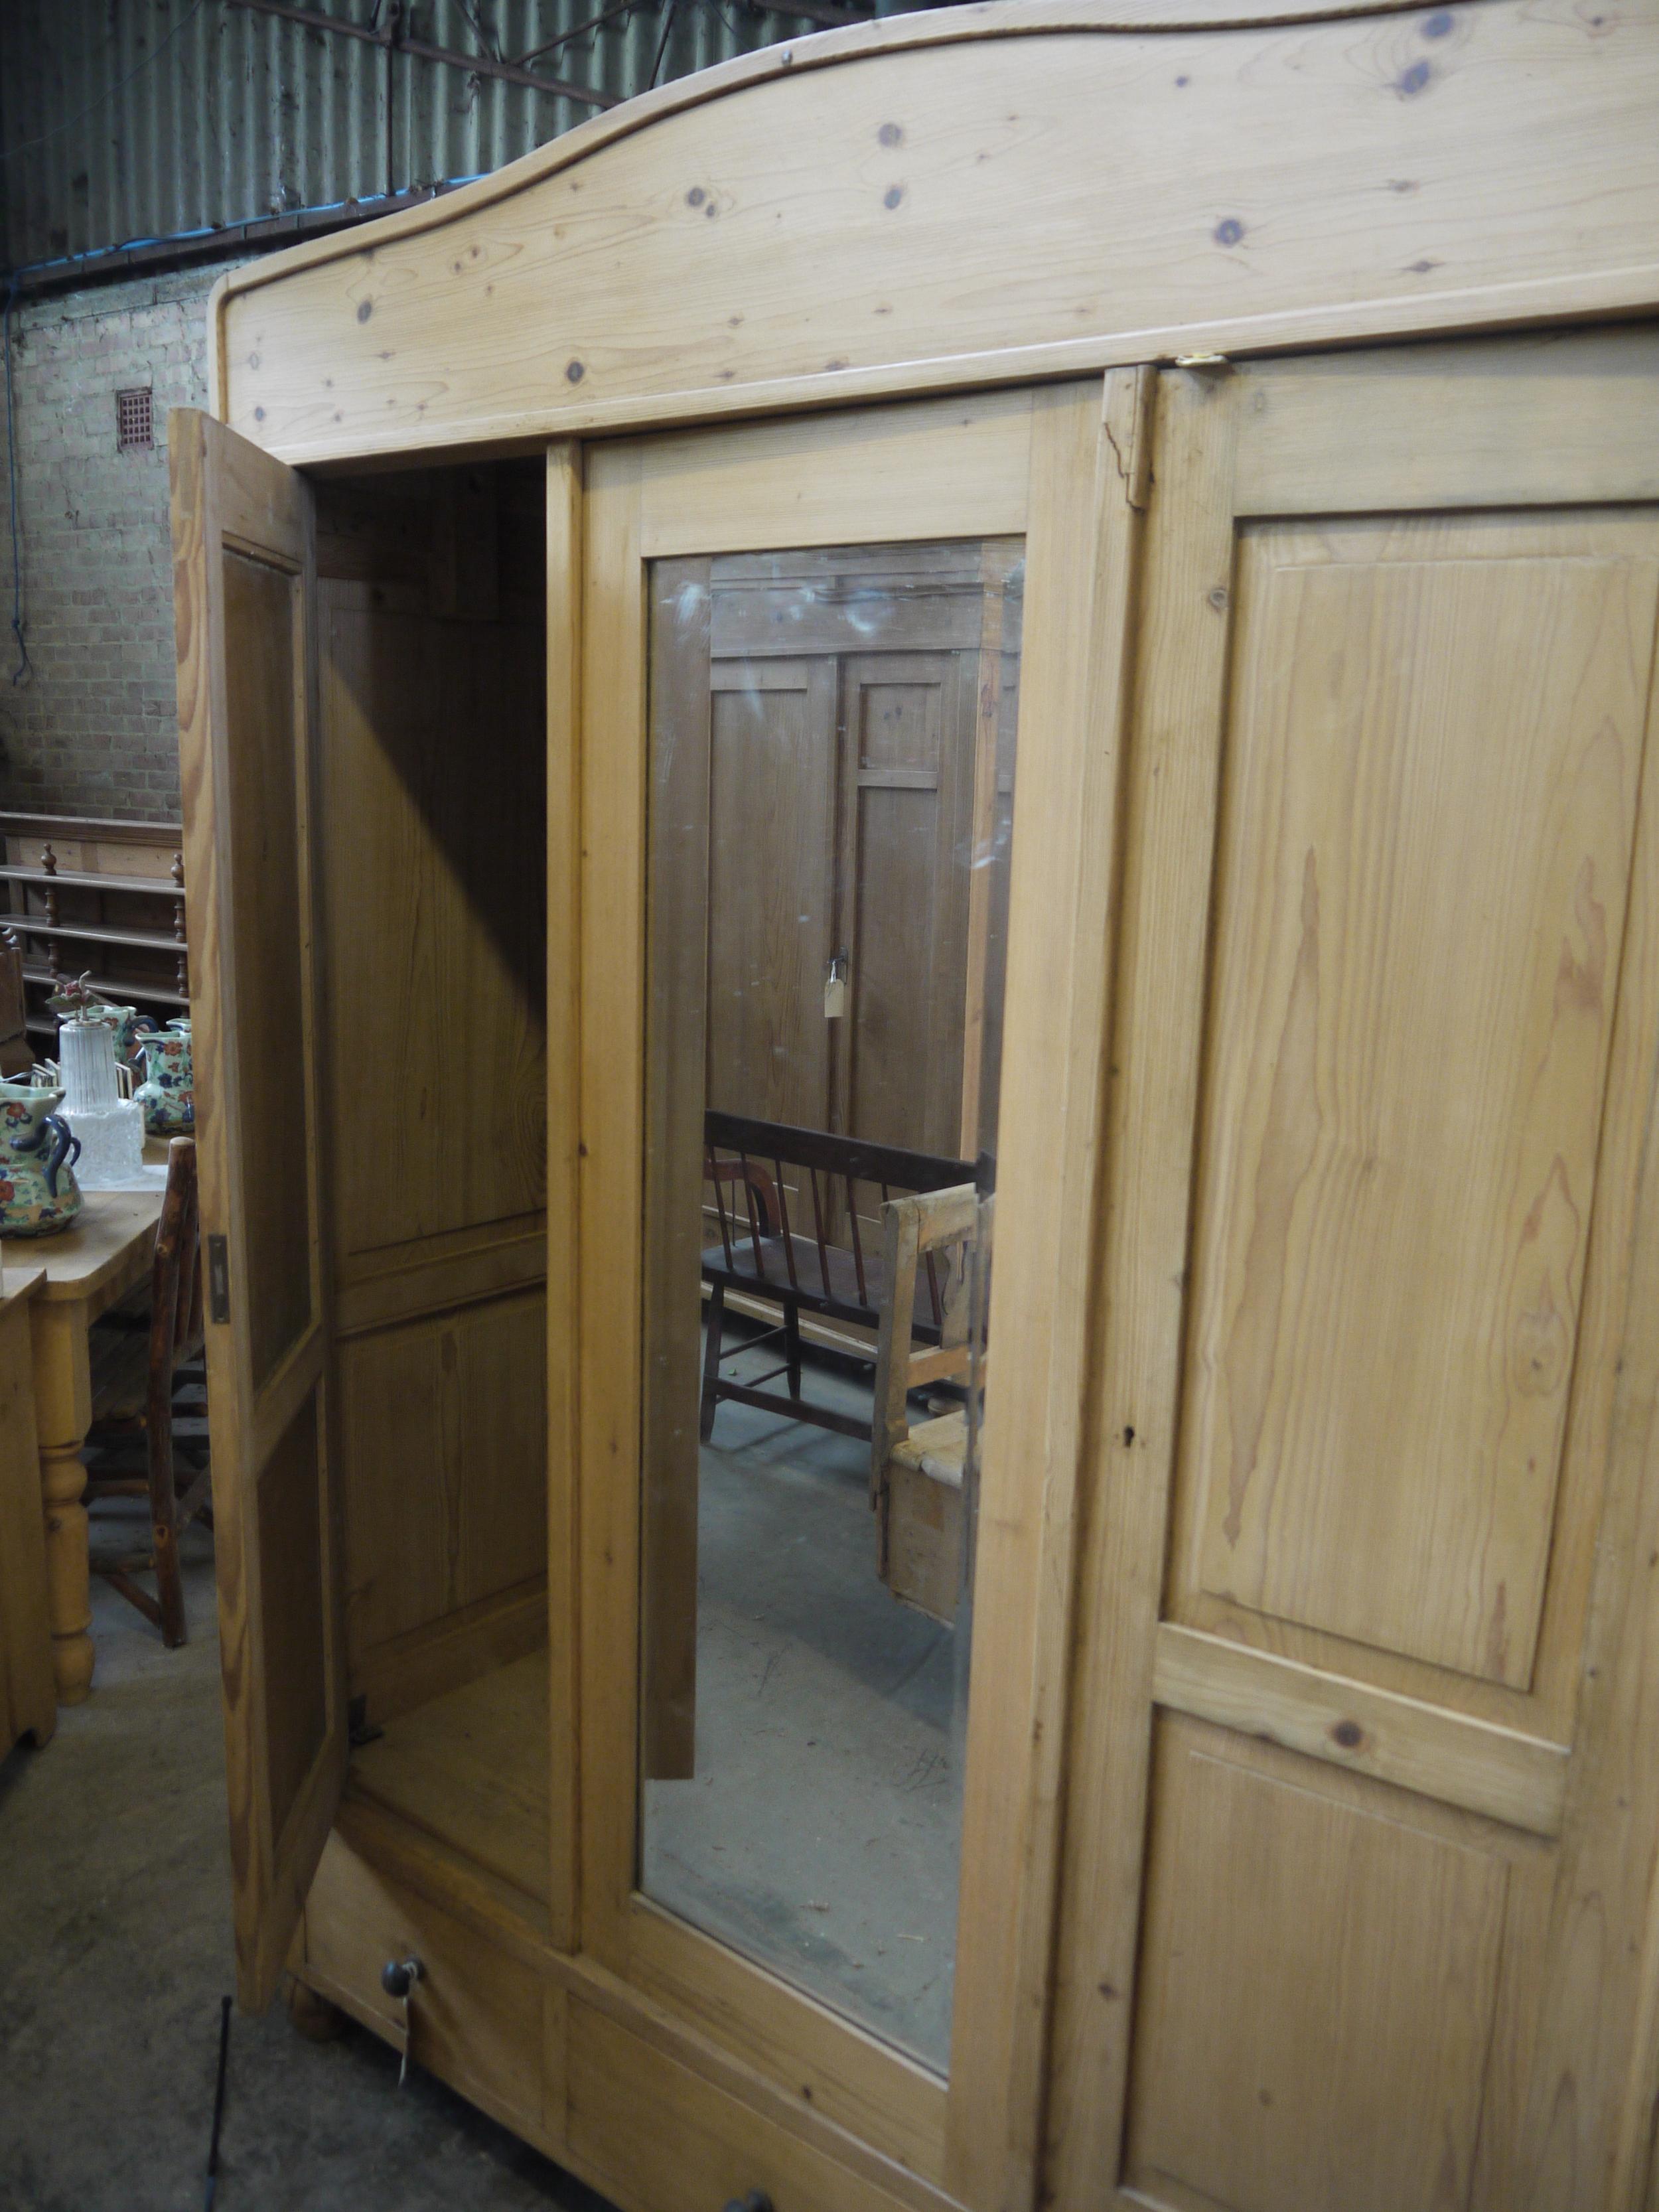 5 01 - 1900 Pine wardrobe with mirror